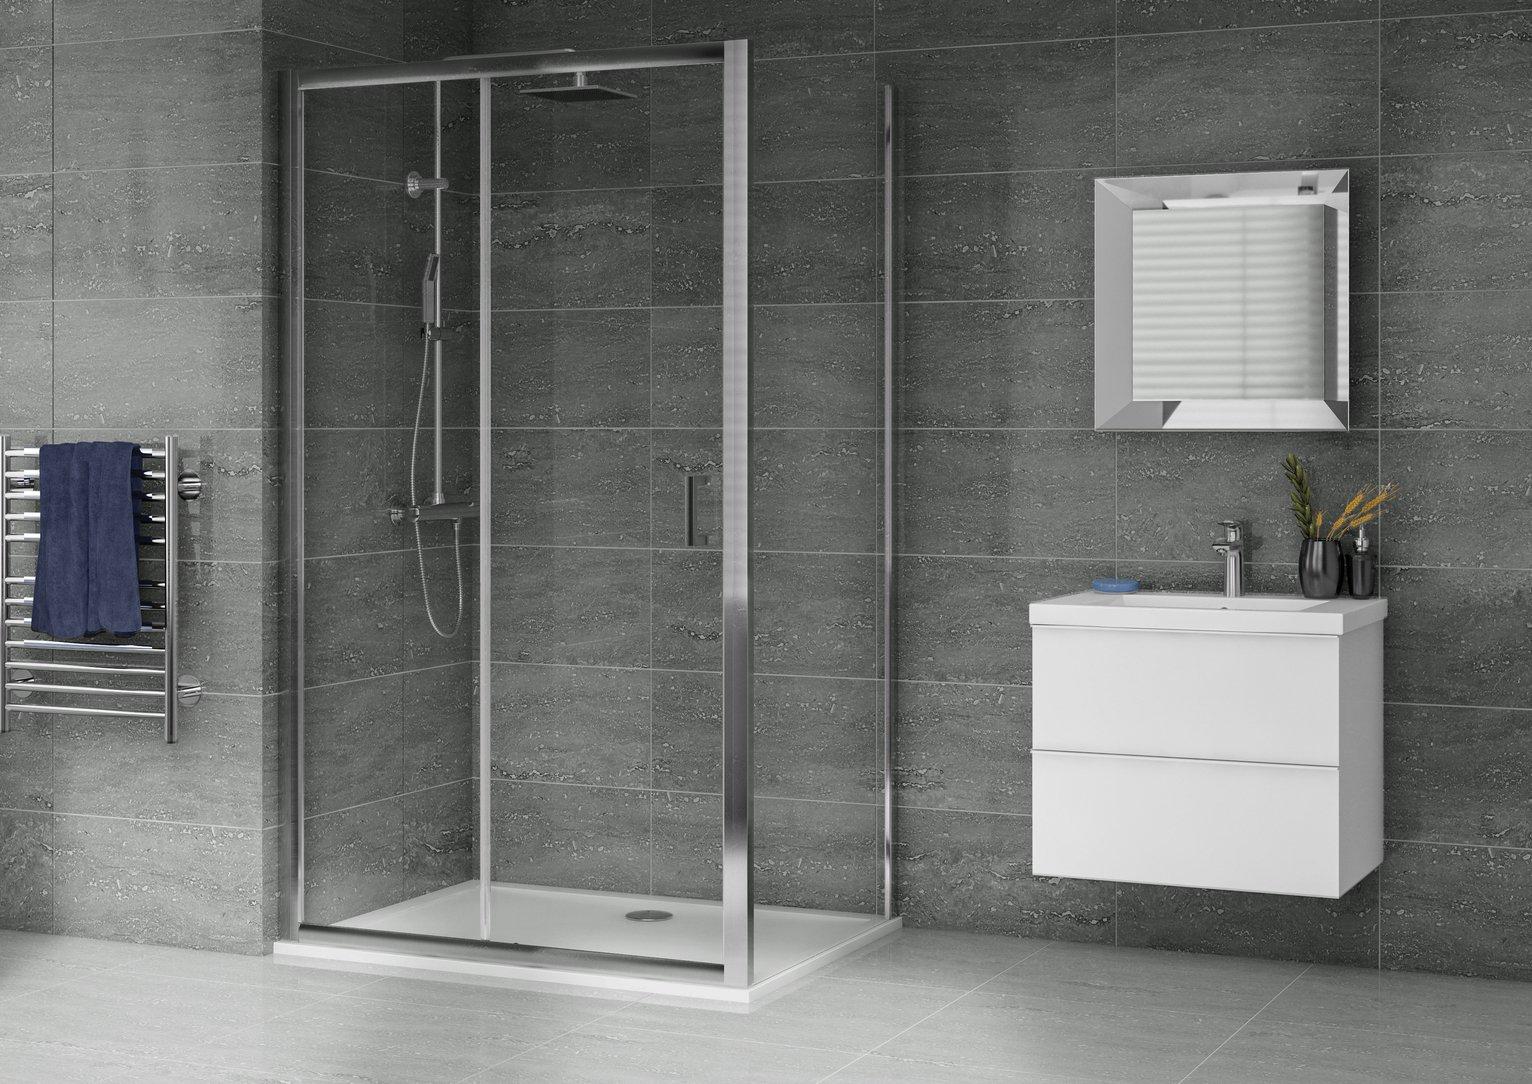 Aqualux 1200mm x 800mm Sliding Door Shower Enclosure & Tray